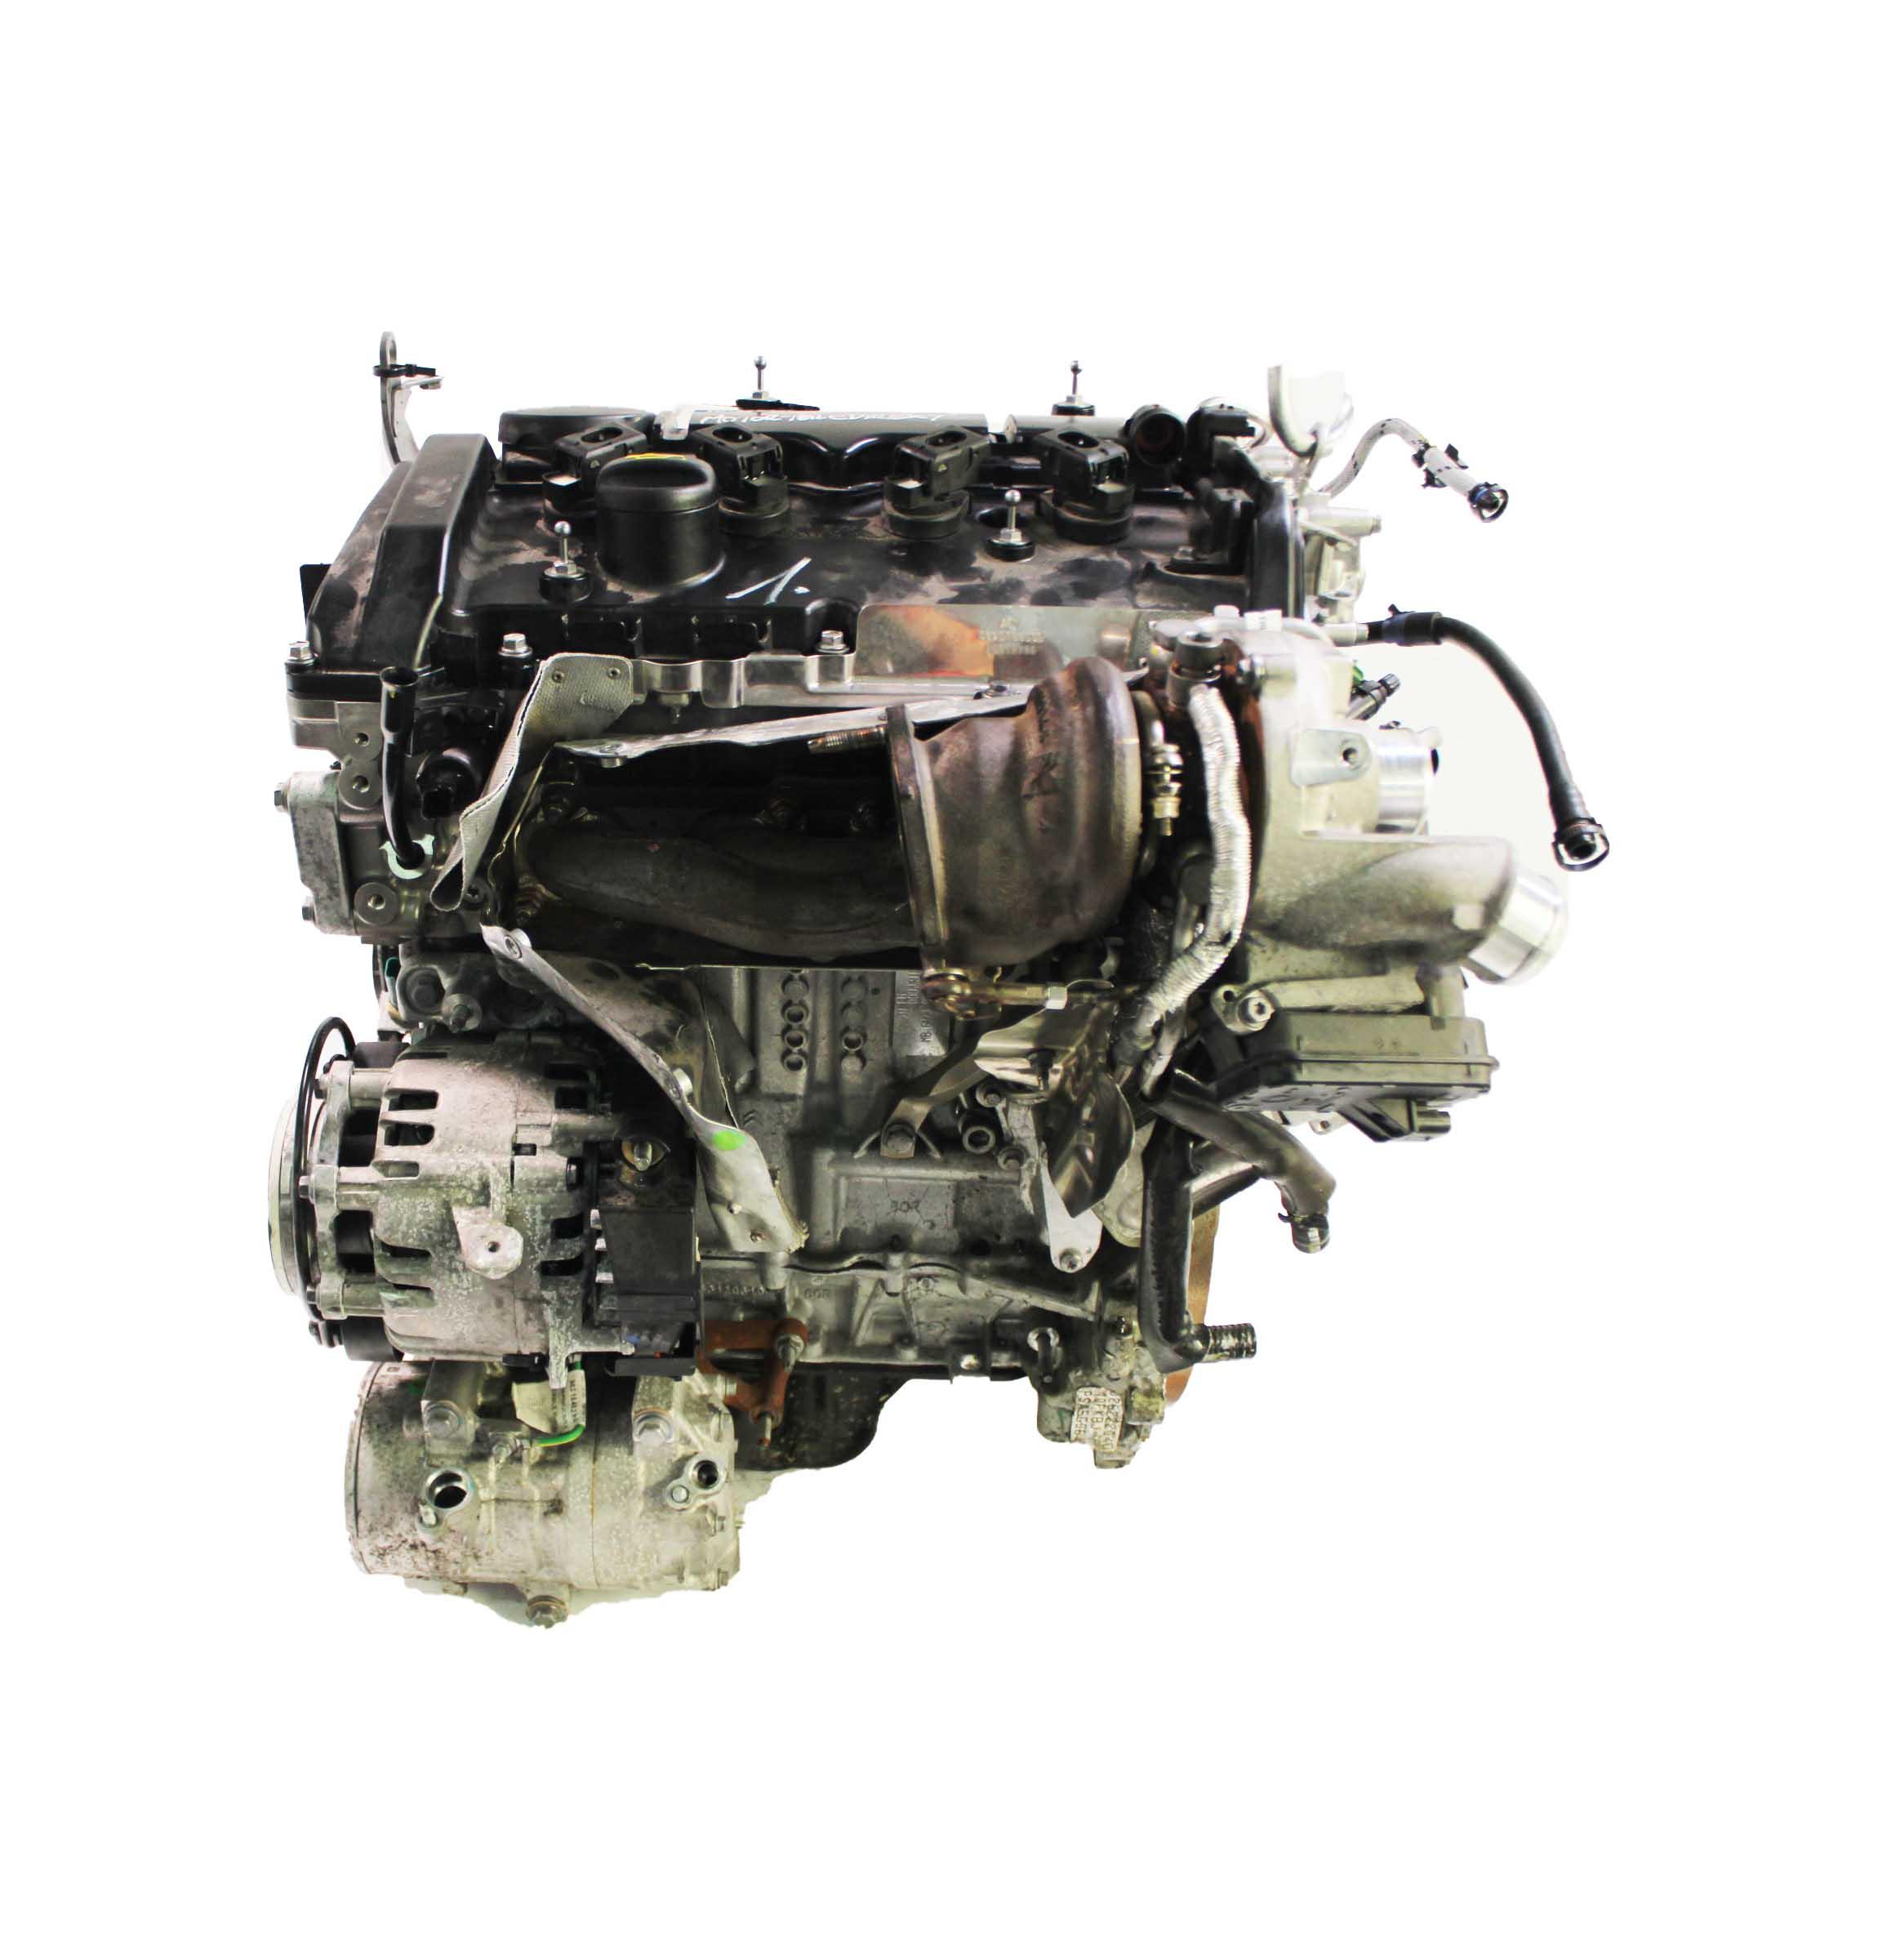 Motor für Peugeot 3008 SUV 1,6 Hybrid4 5GB 5G06 EP6FADTX 200 PS